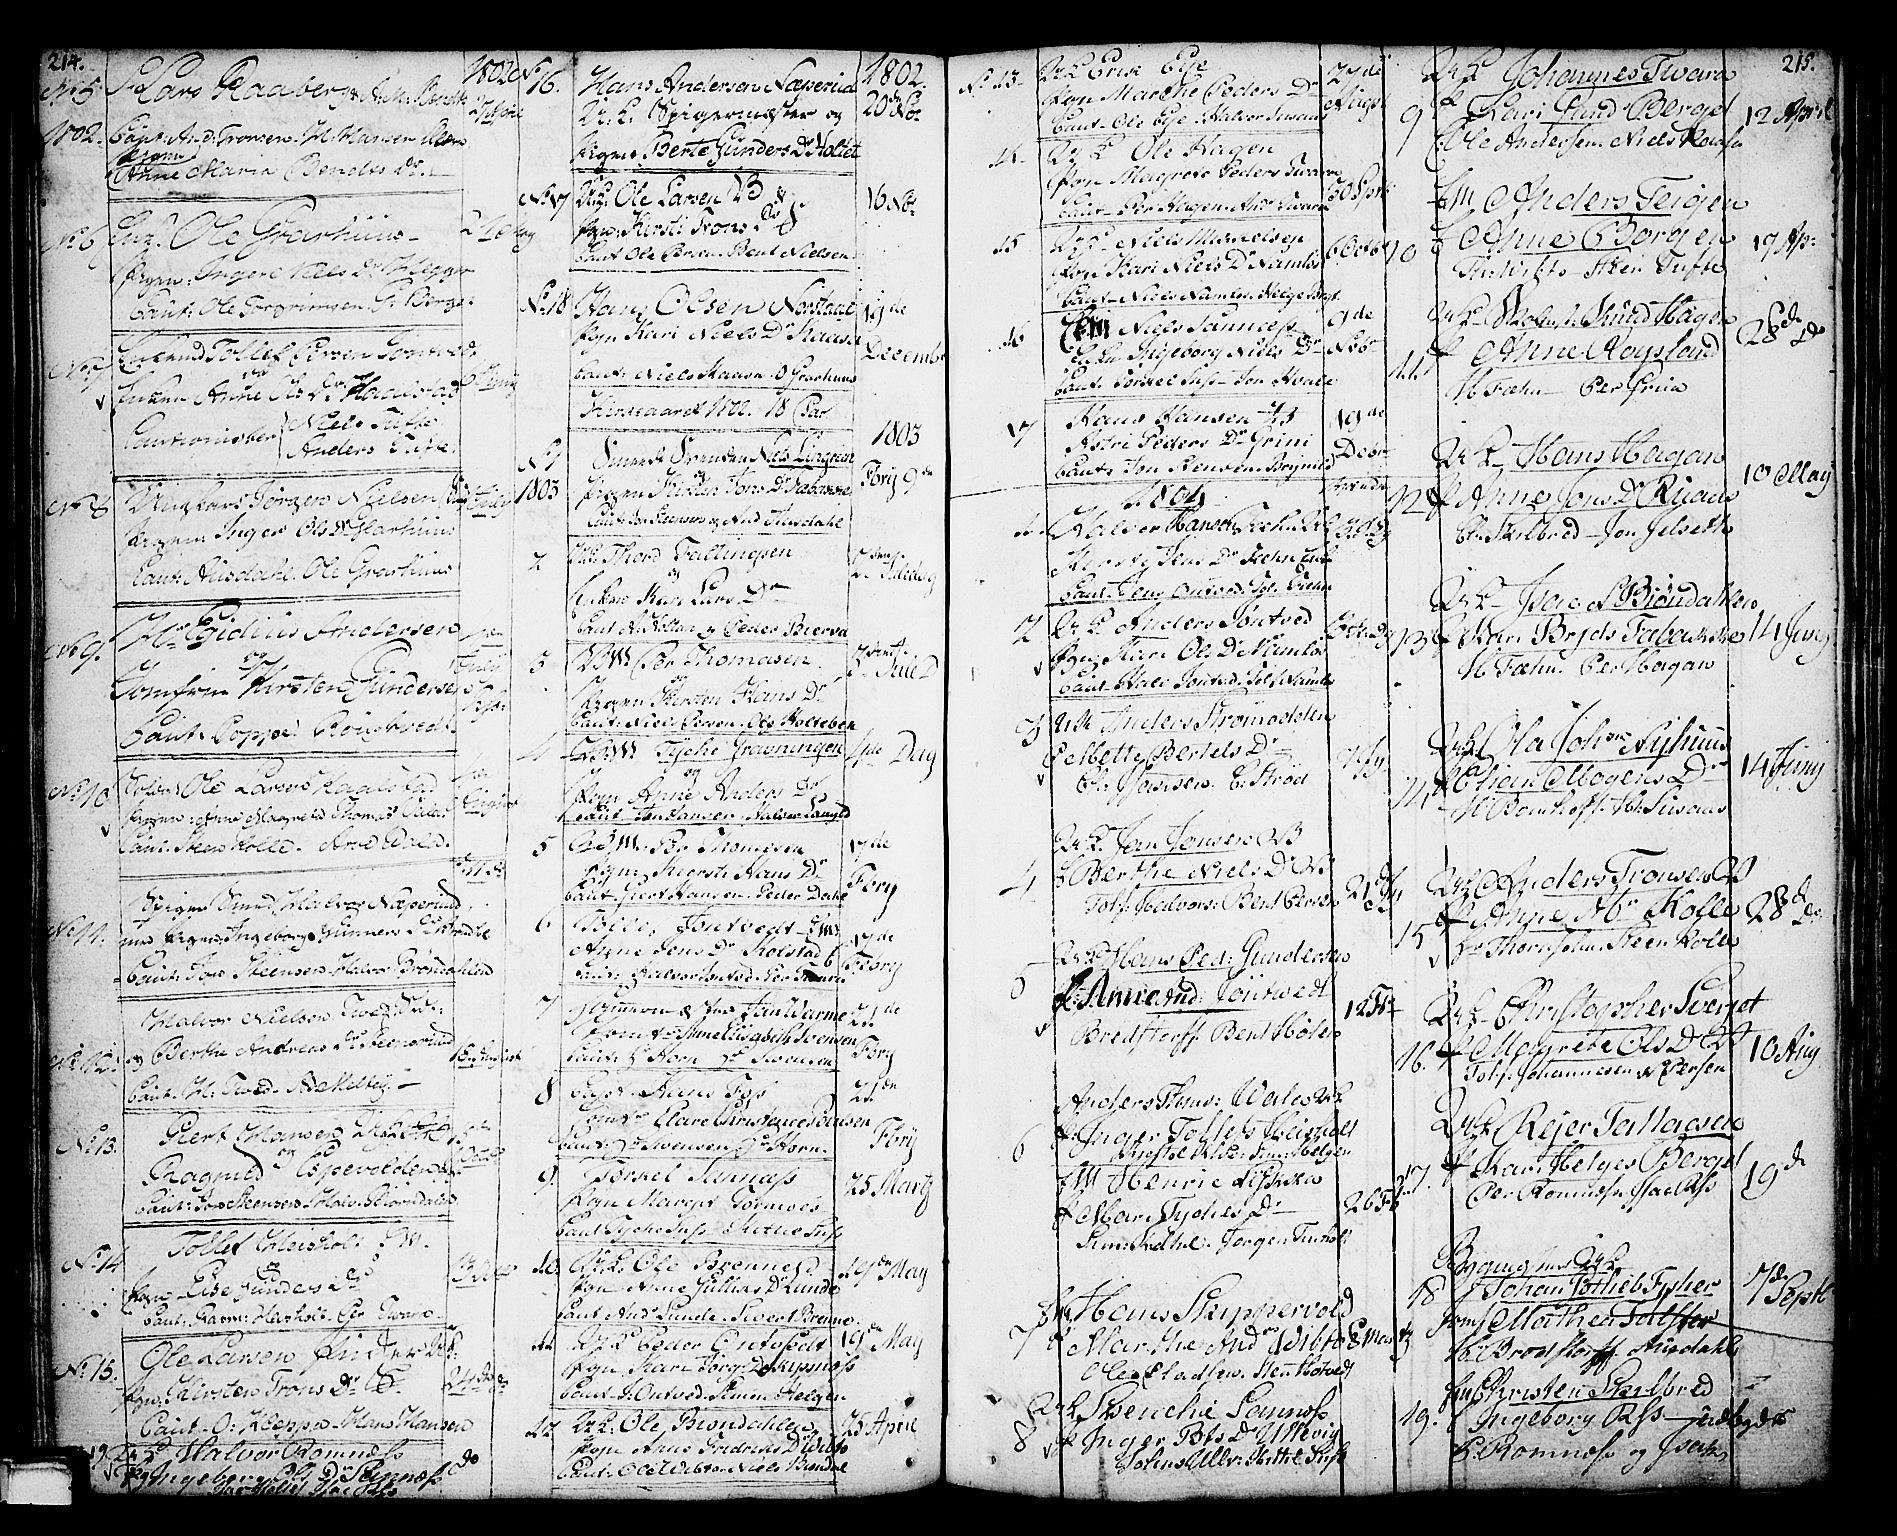 SAKO, Holla kirkebøker, F/Fa/L0002: Ministerialbok nr. 2, 1779-1814, s. 214-215